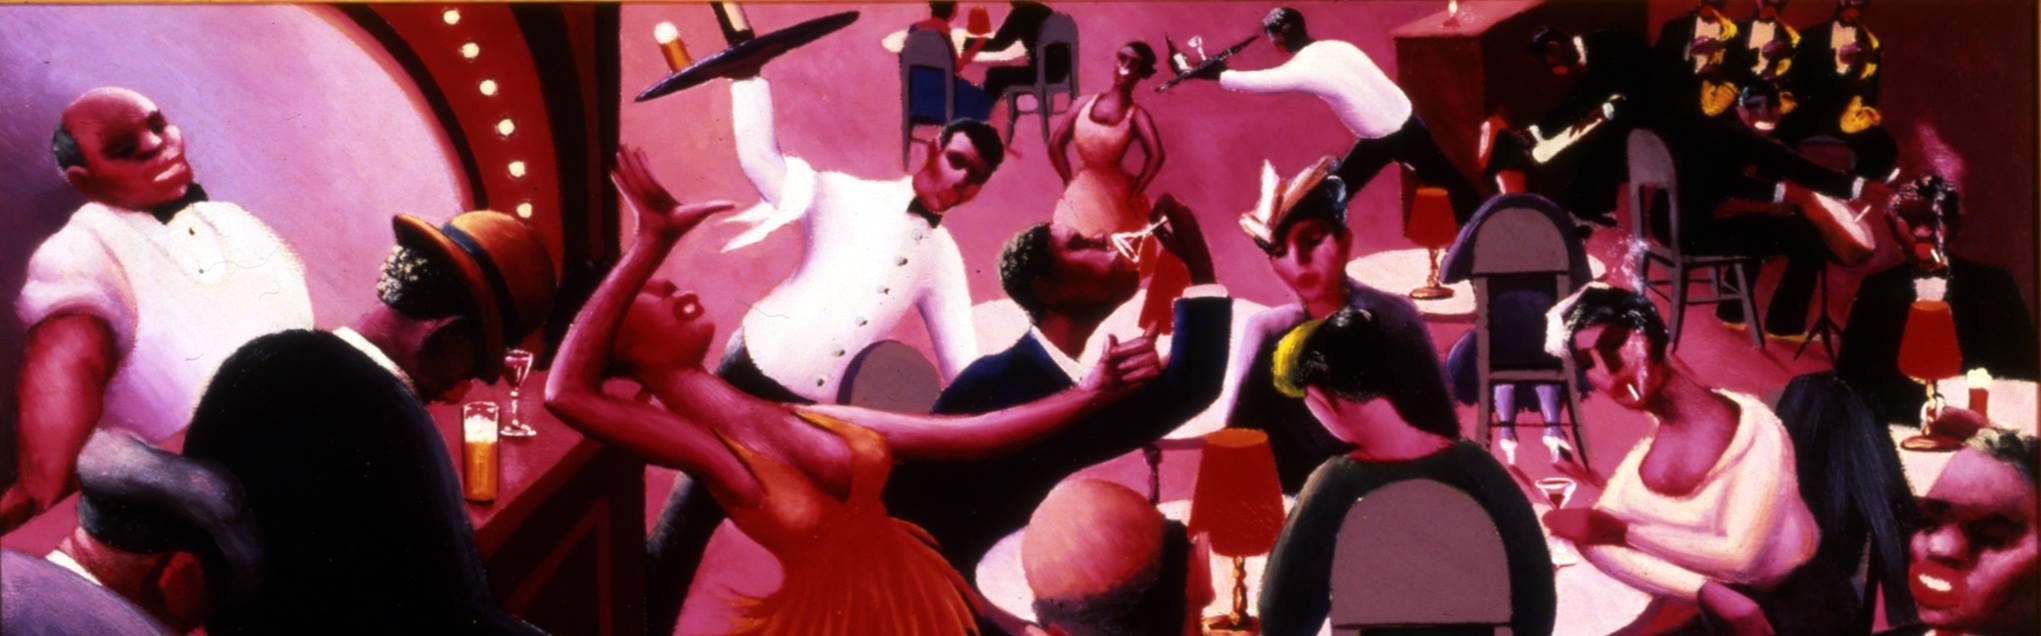 Saturday Night  (1935) by Archibald Motley